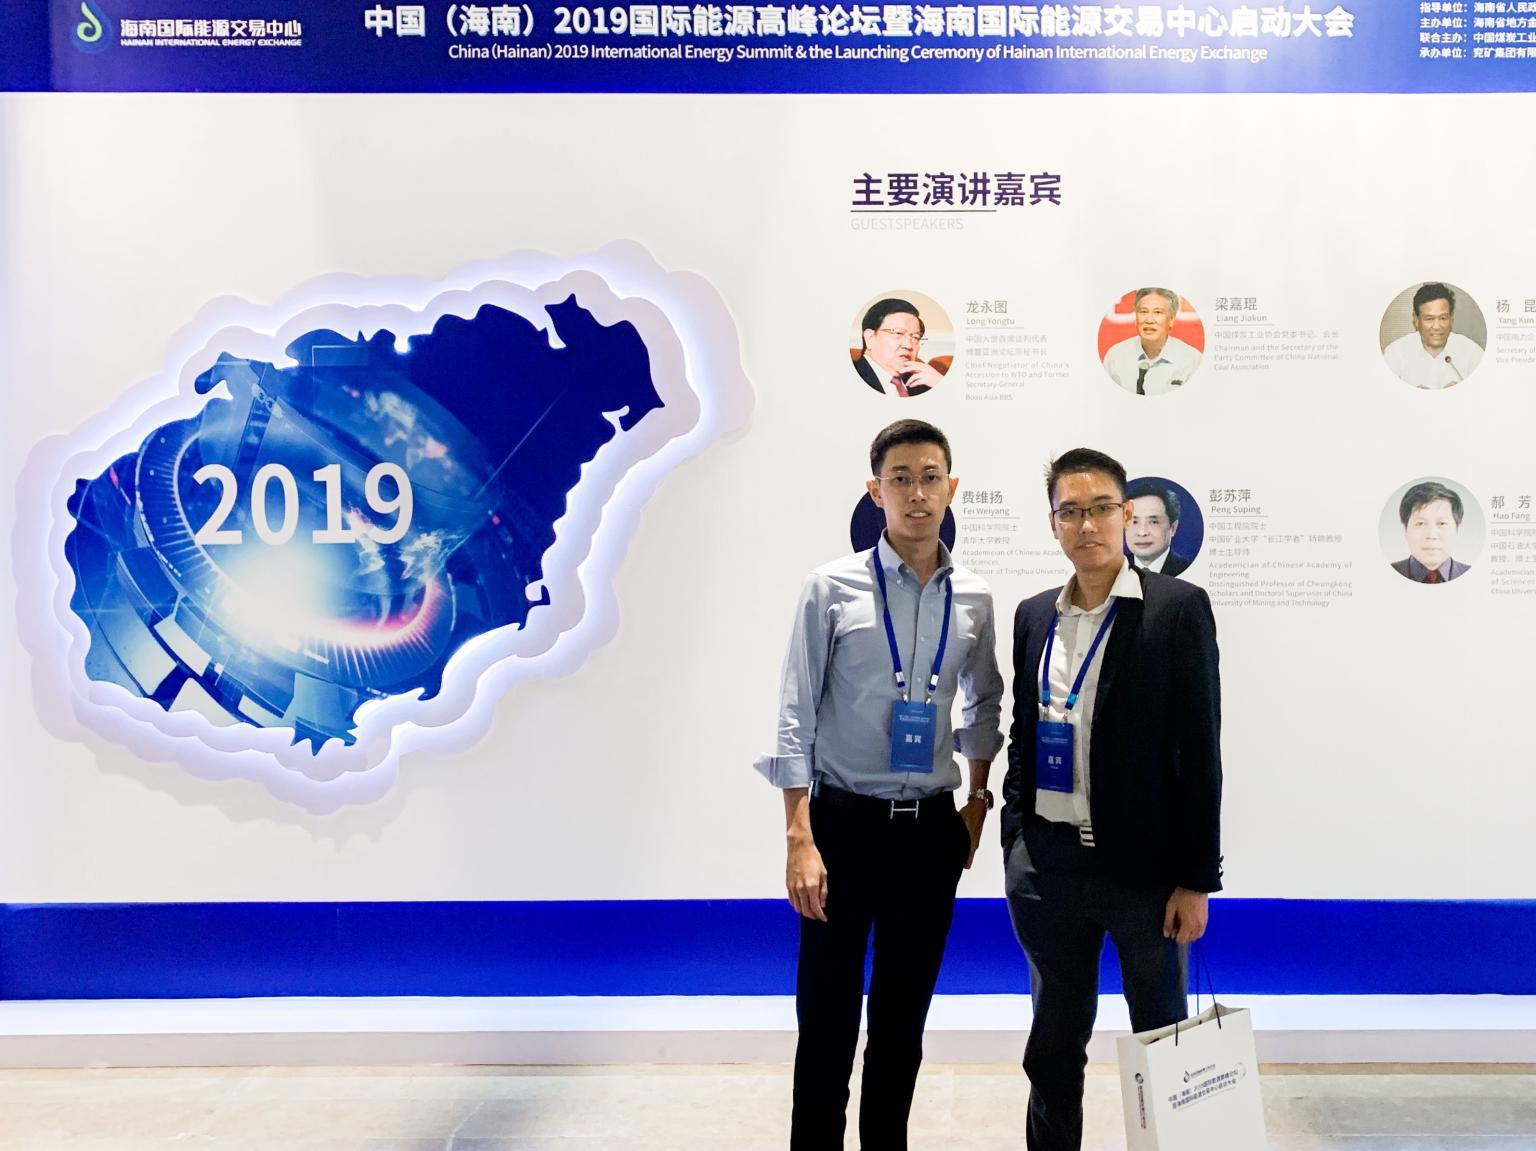 2019 International Energy Summit & the Launching Ceremony of Hainan International Energy Exchange